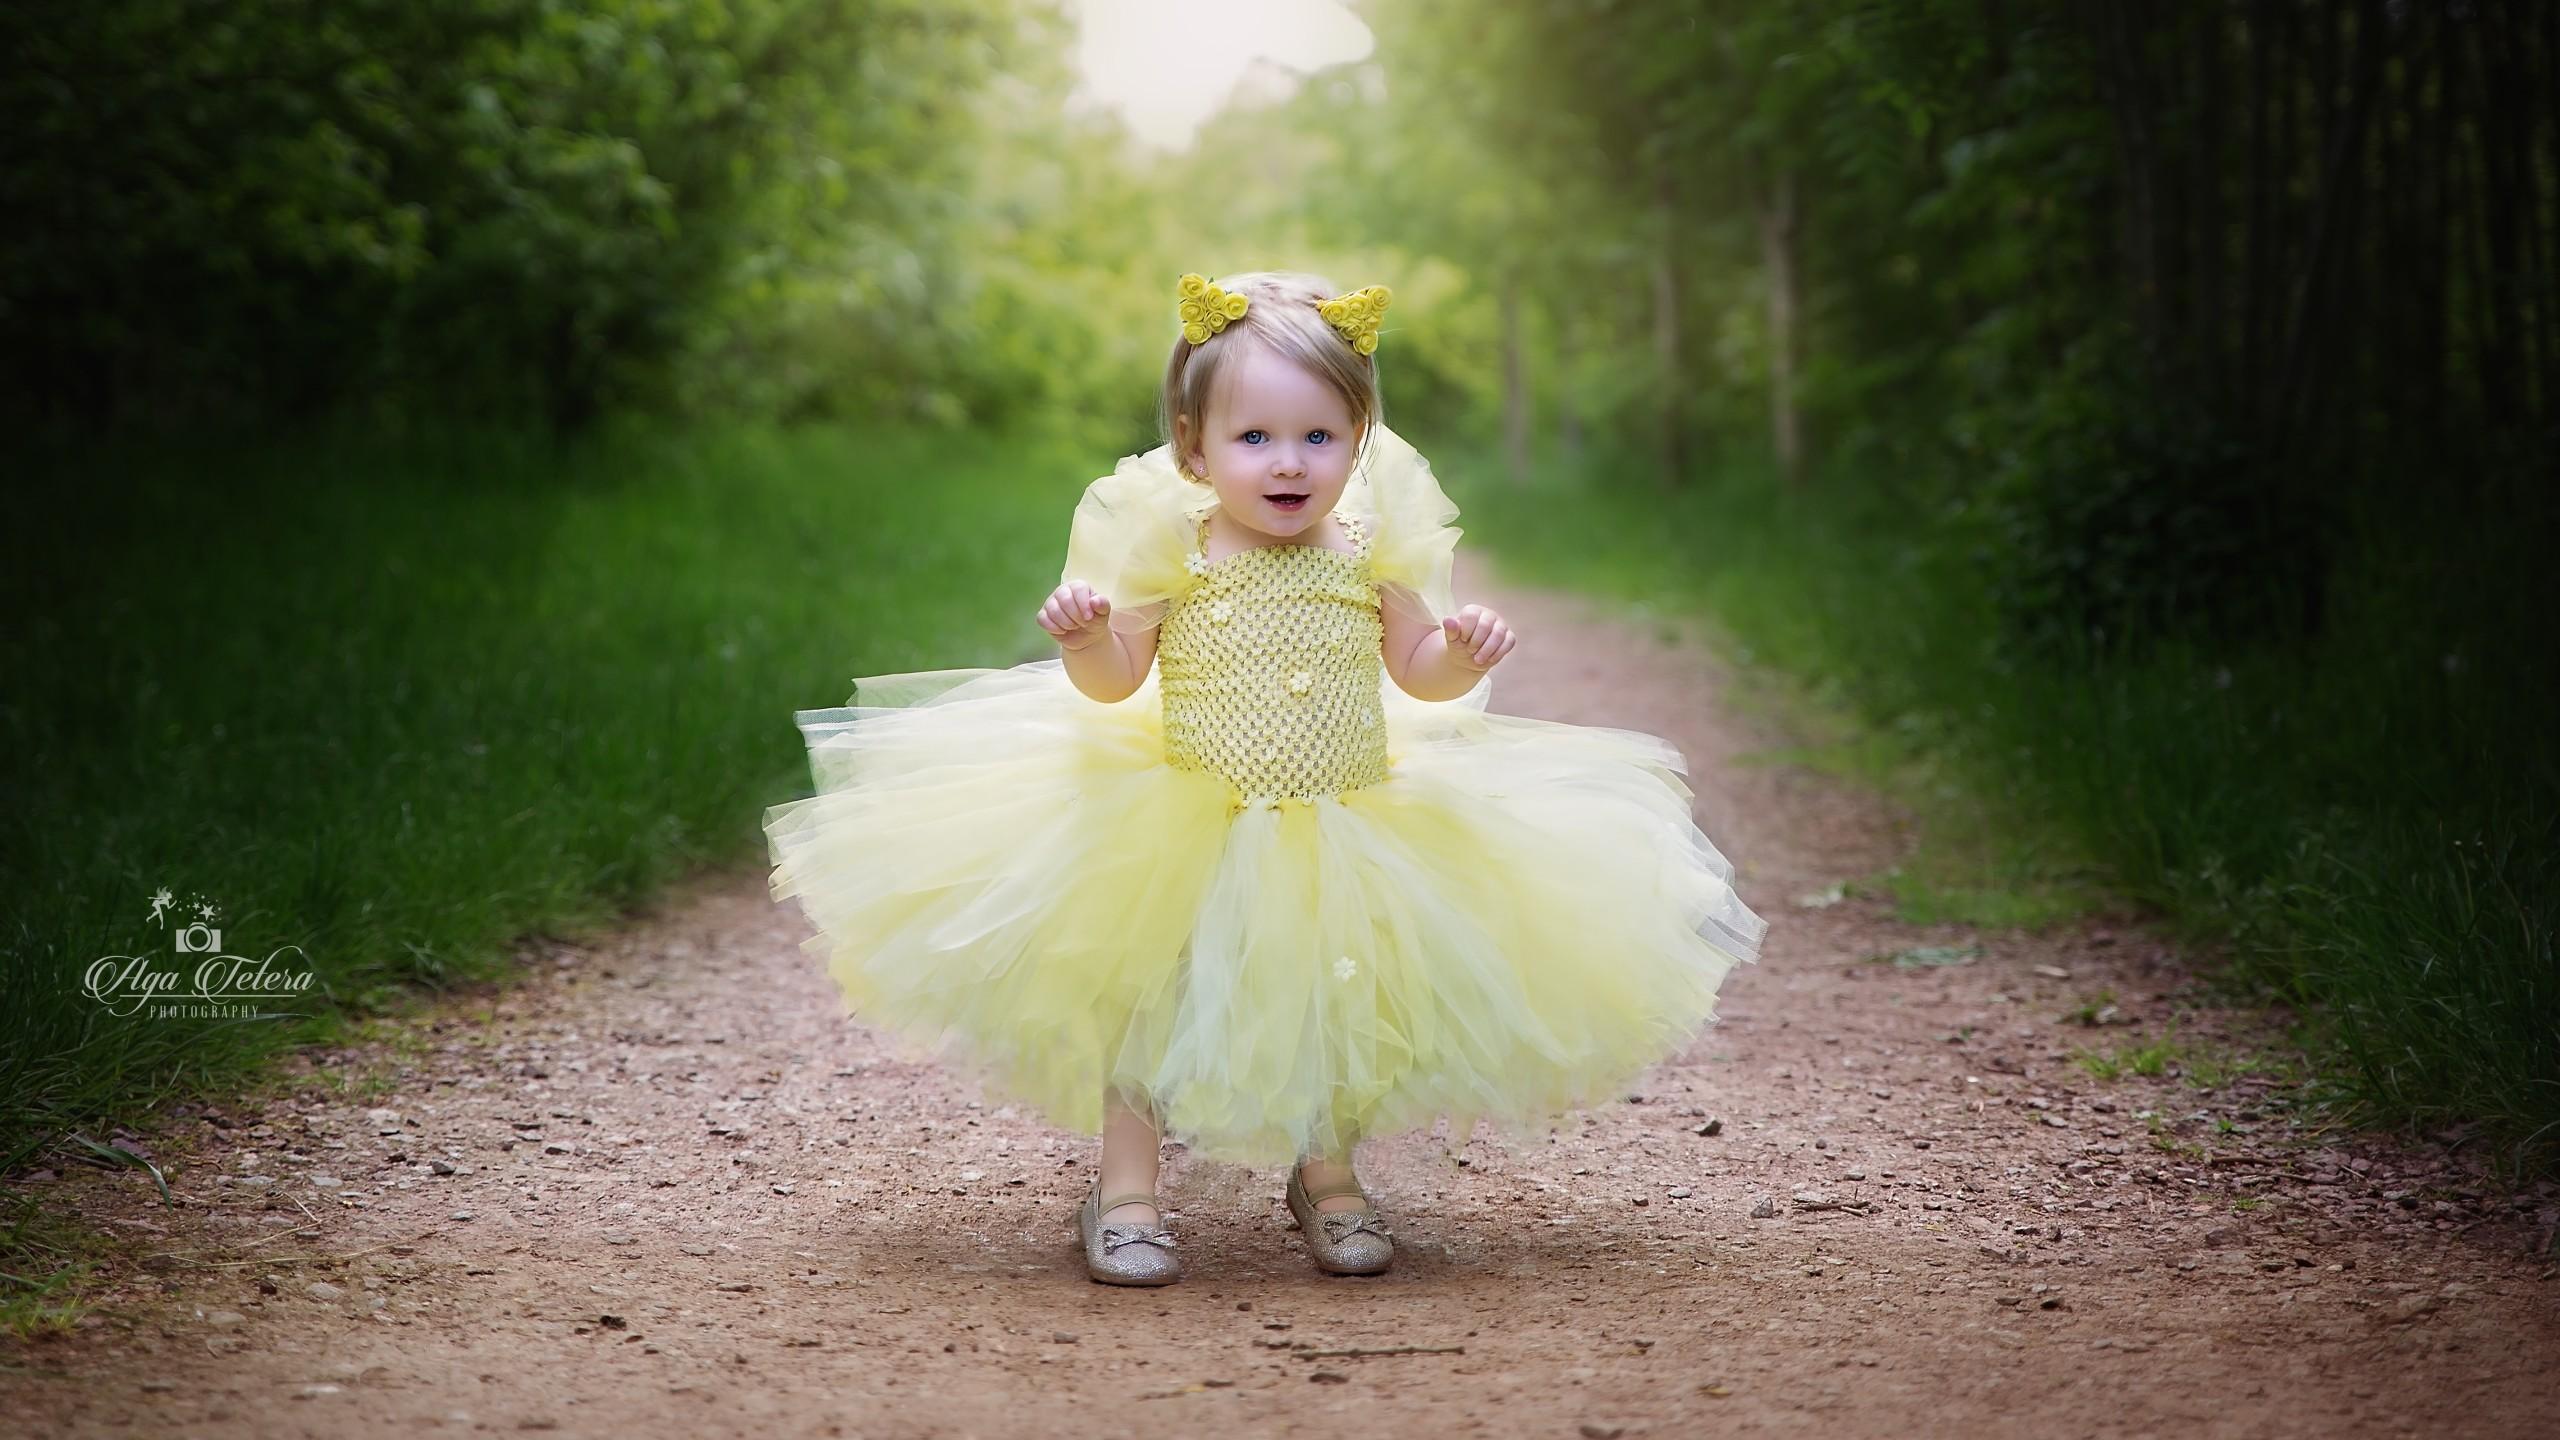 Cute Girl Smiling Hd Wallpaper Baby Girl Wallpaper Images 70 Images